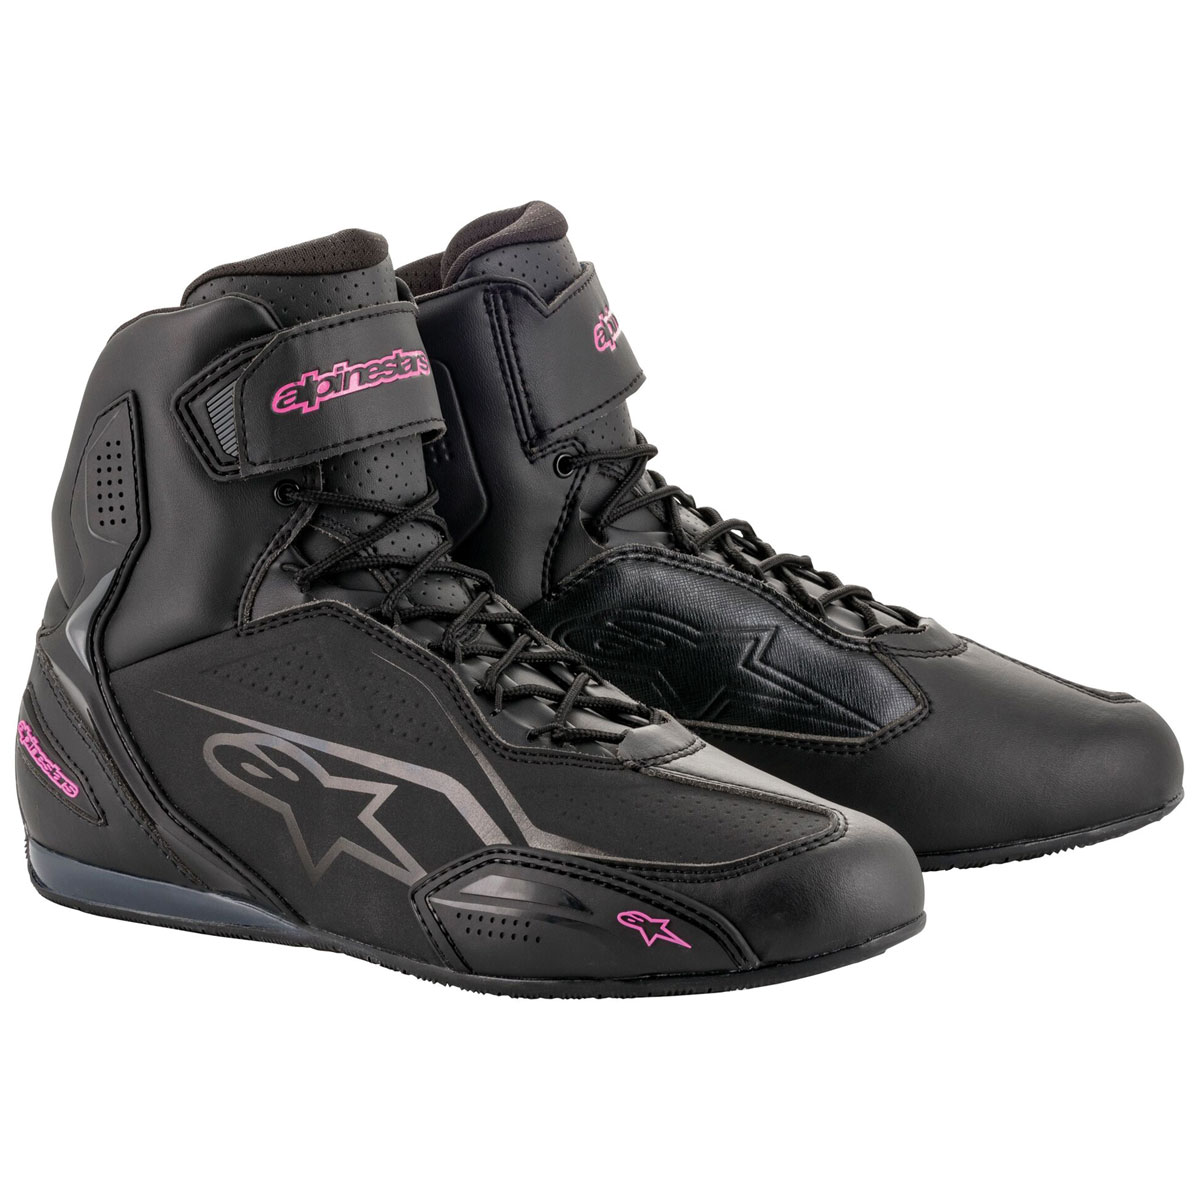 Alpinestars Women's Stella Faster-3 Black/Fuchsia Boots